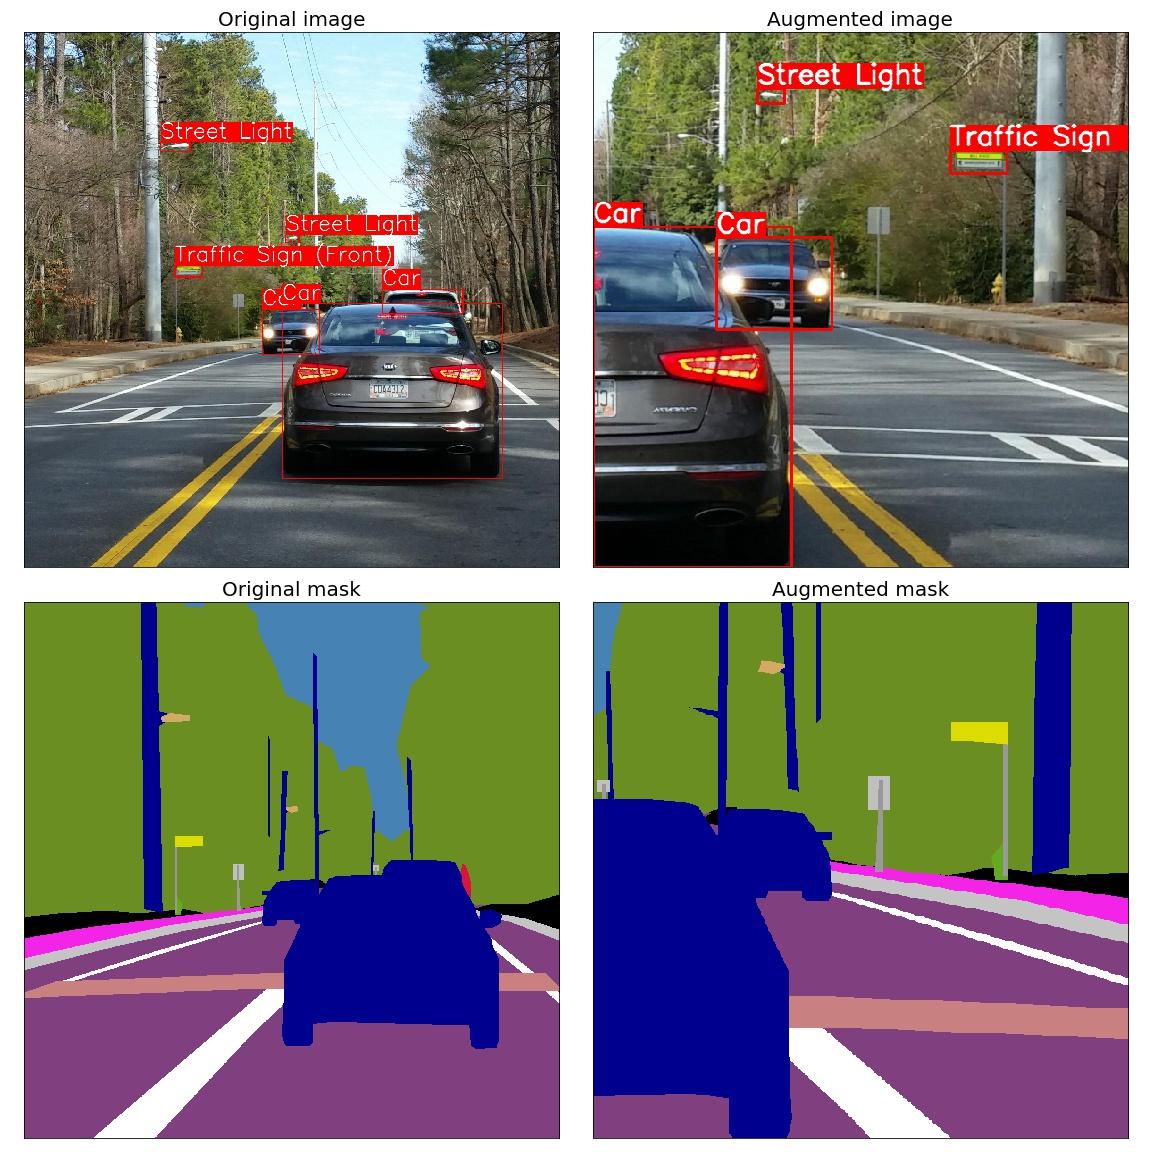 GitHub - albu/albumentations: fast image augmentation